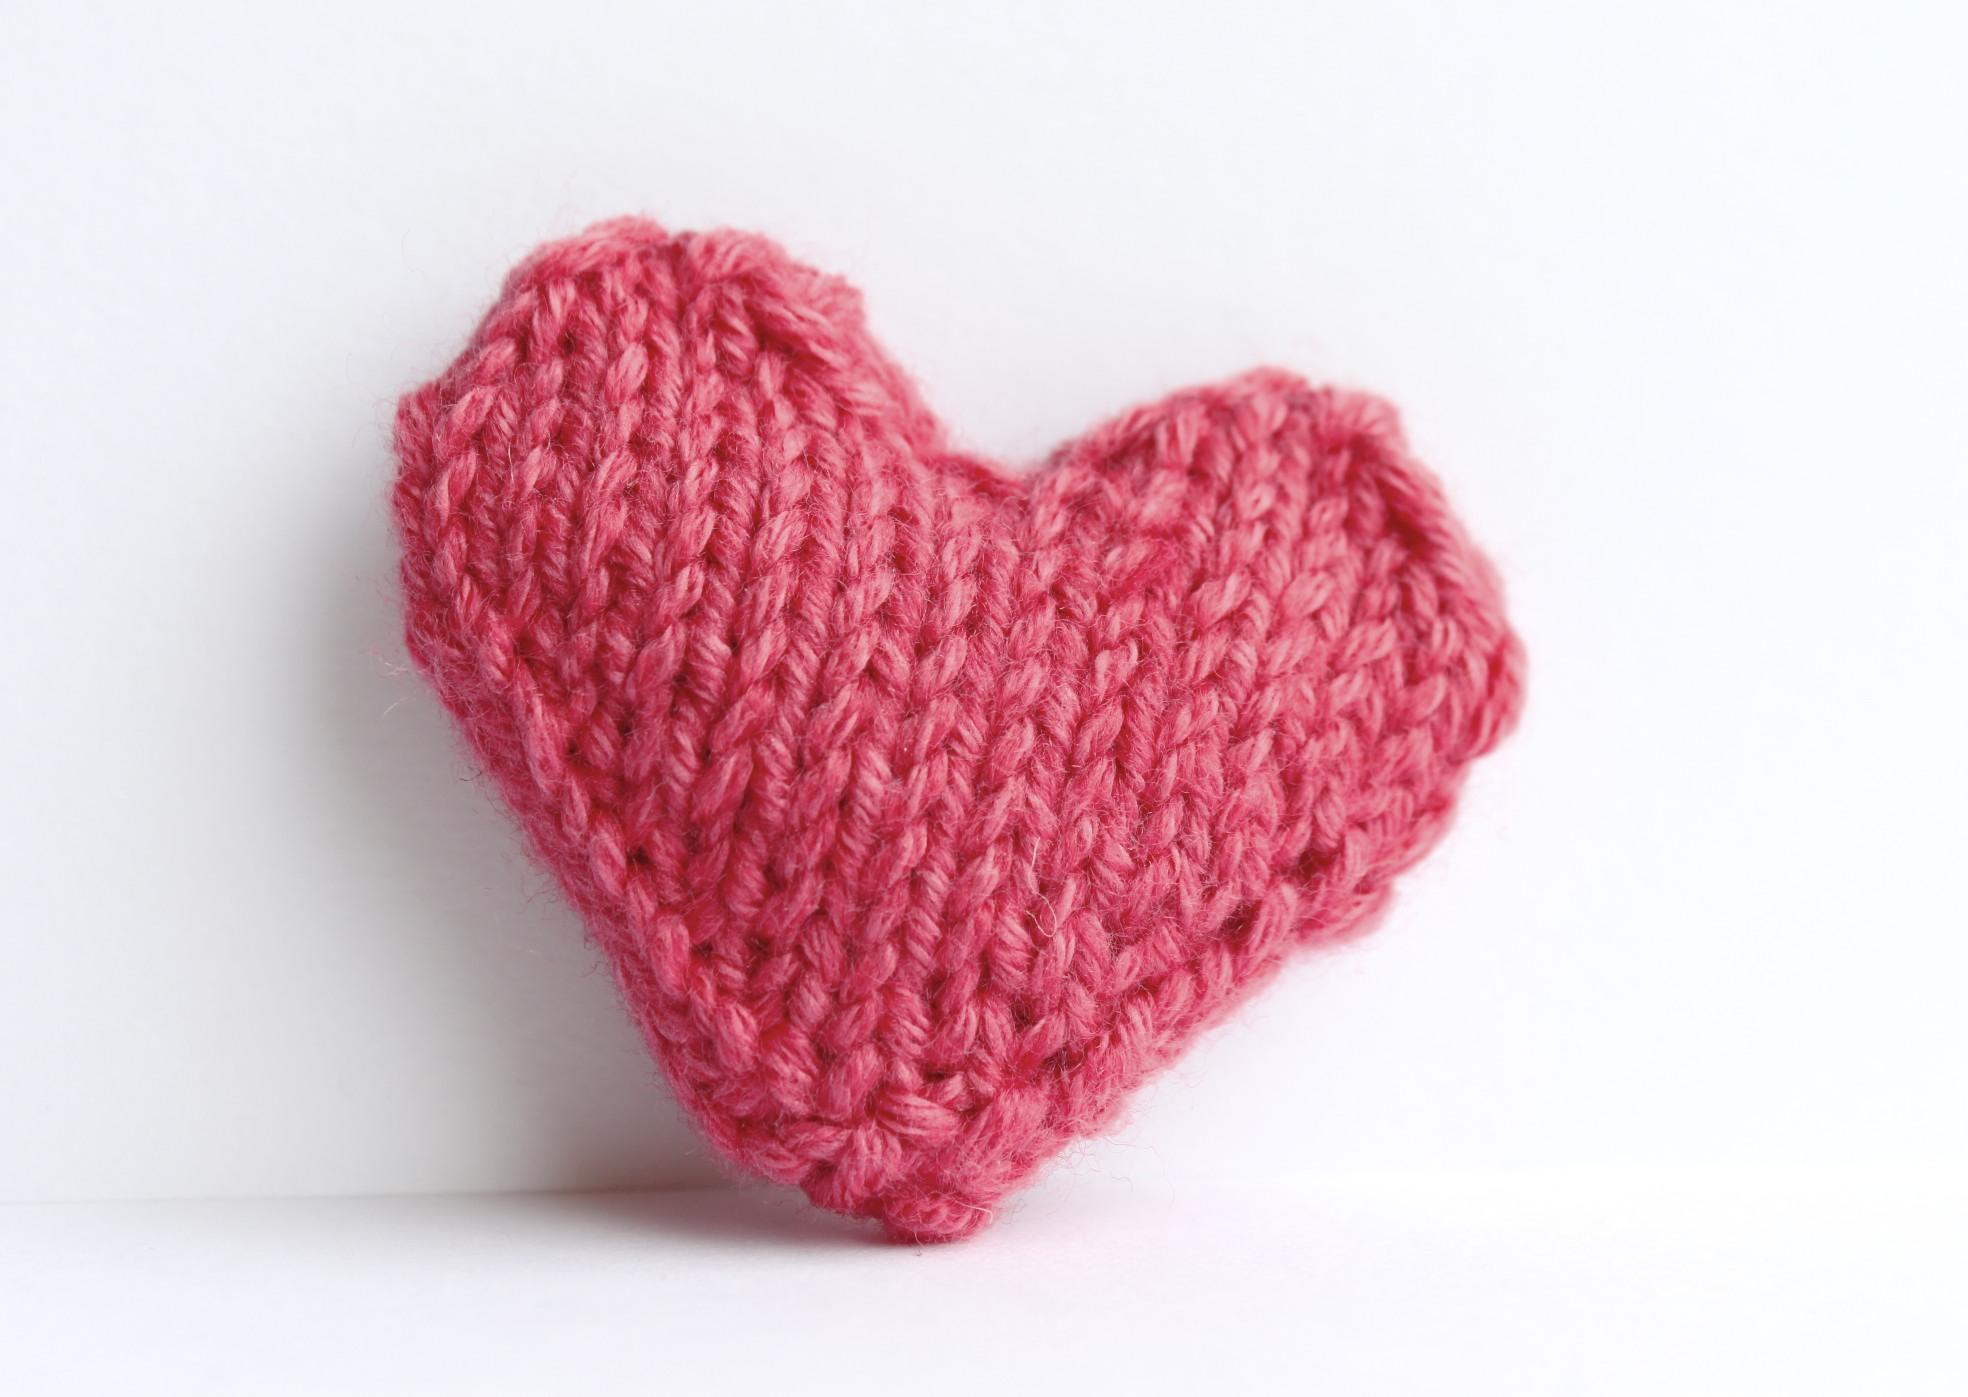 Heart Pin Brooch Knitted In Bubblegum Pink on Luulla